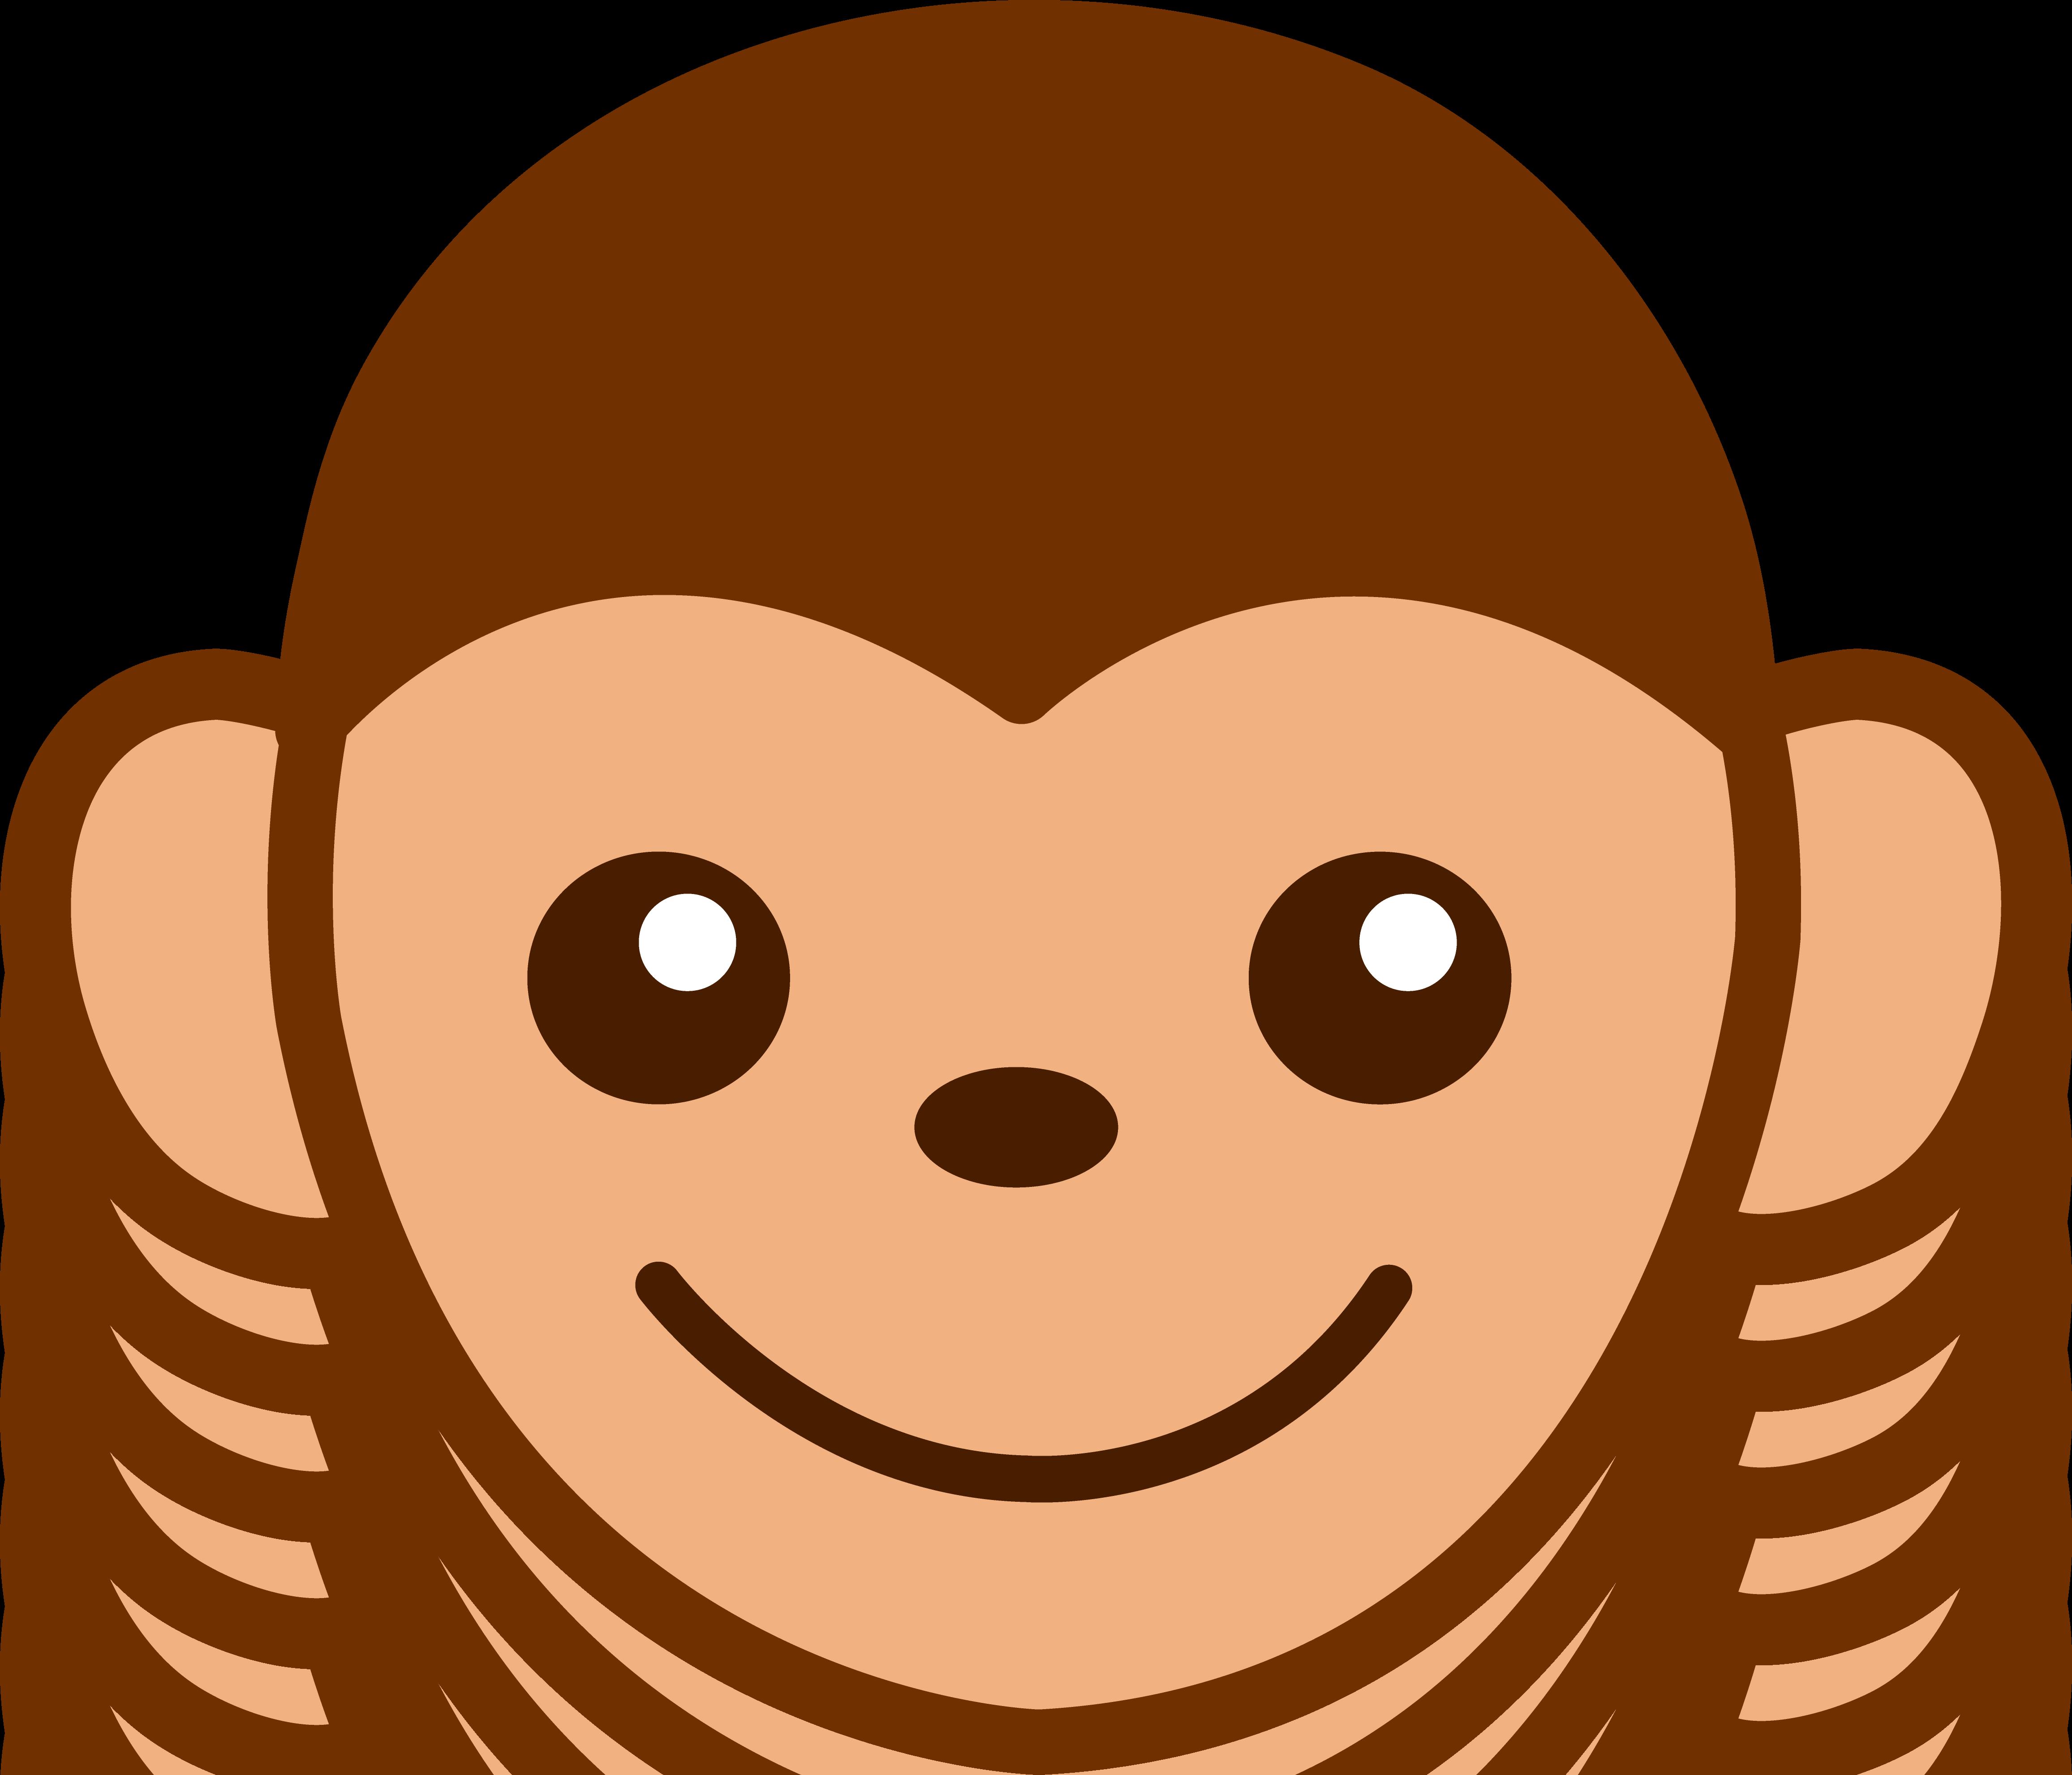 3 monkeys clipart faces vector royalty free library Free Cute Monkey Clipart, Download Free Clip Art, Free Clip Art on ... vector royalty free library